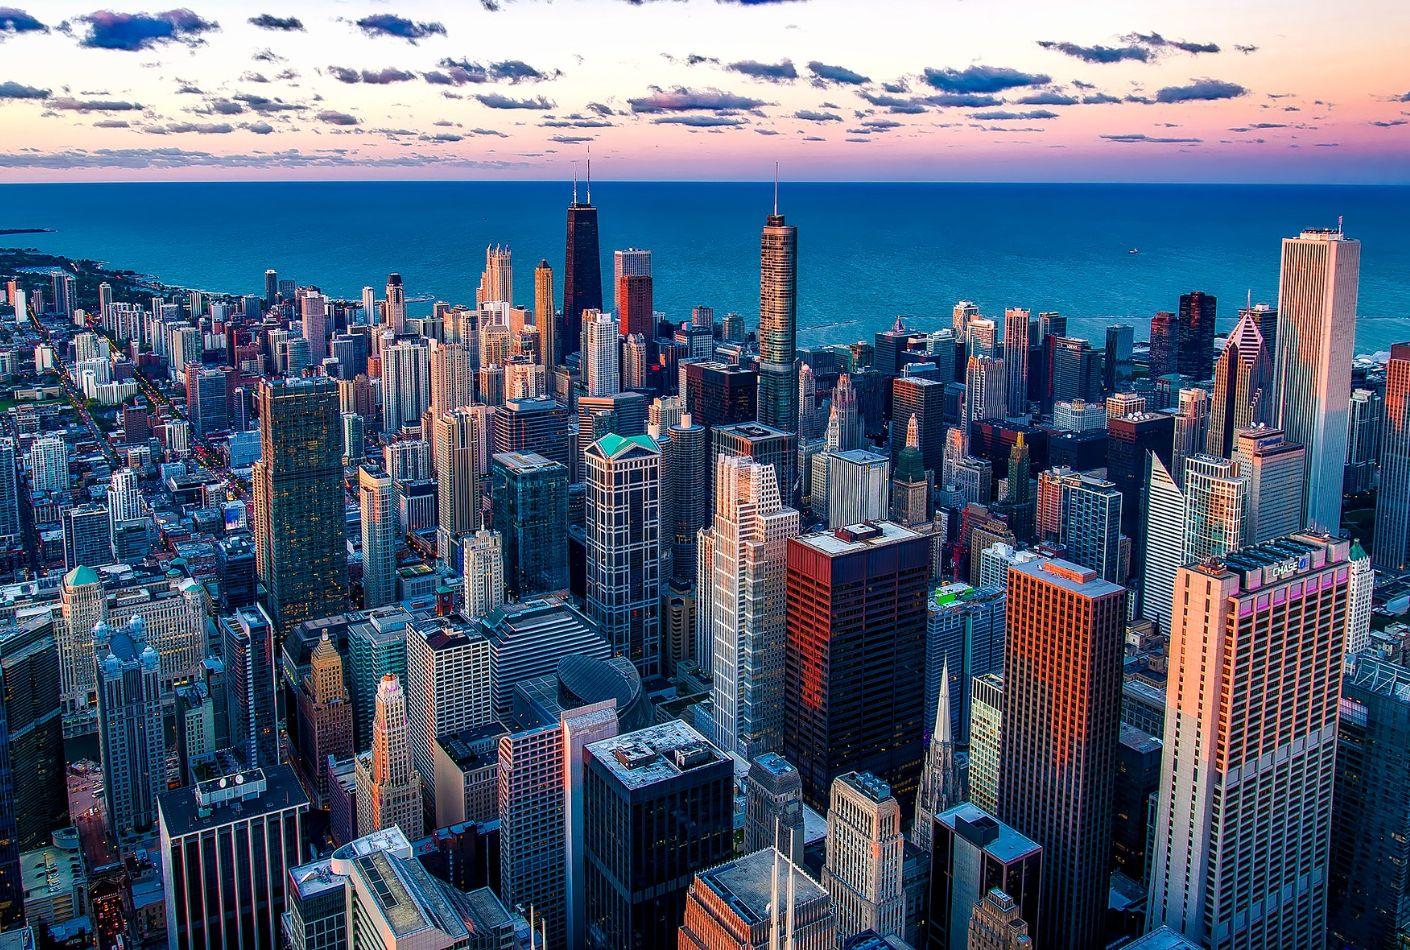 Ciudad de Chicago. Oferta viaje a Chicago.